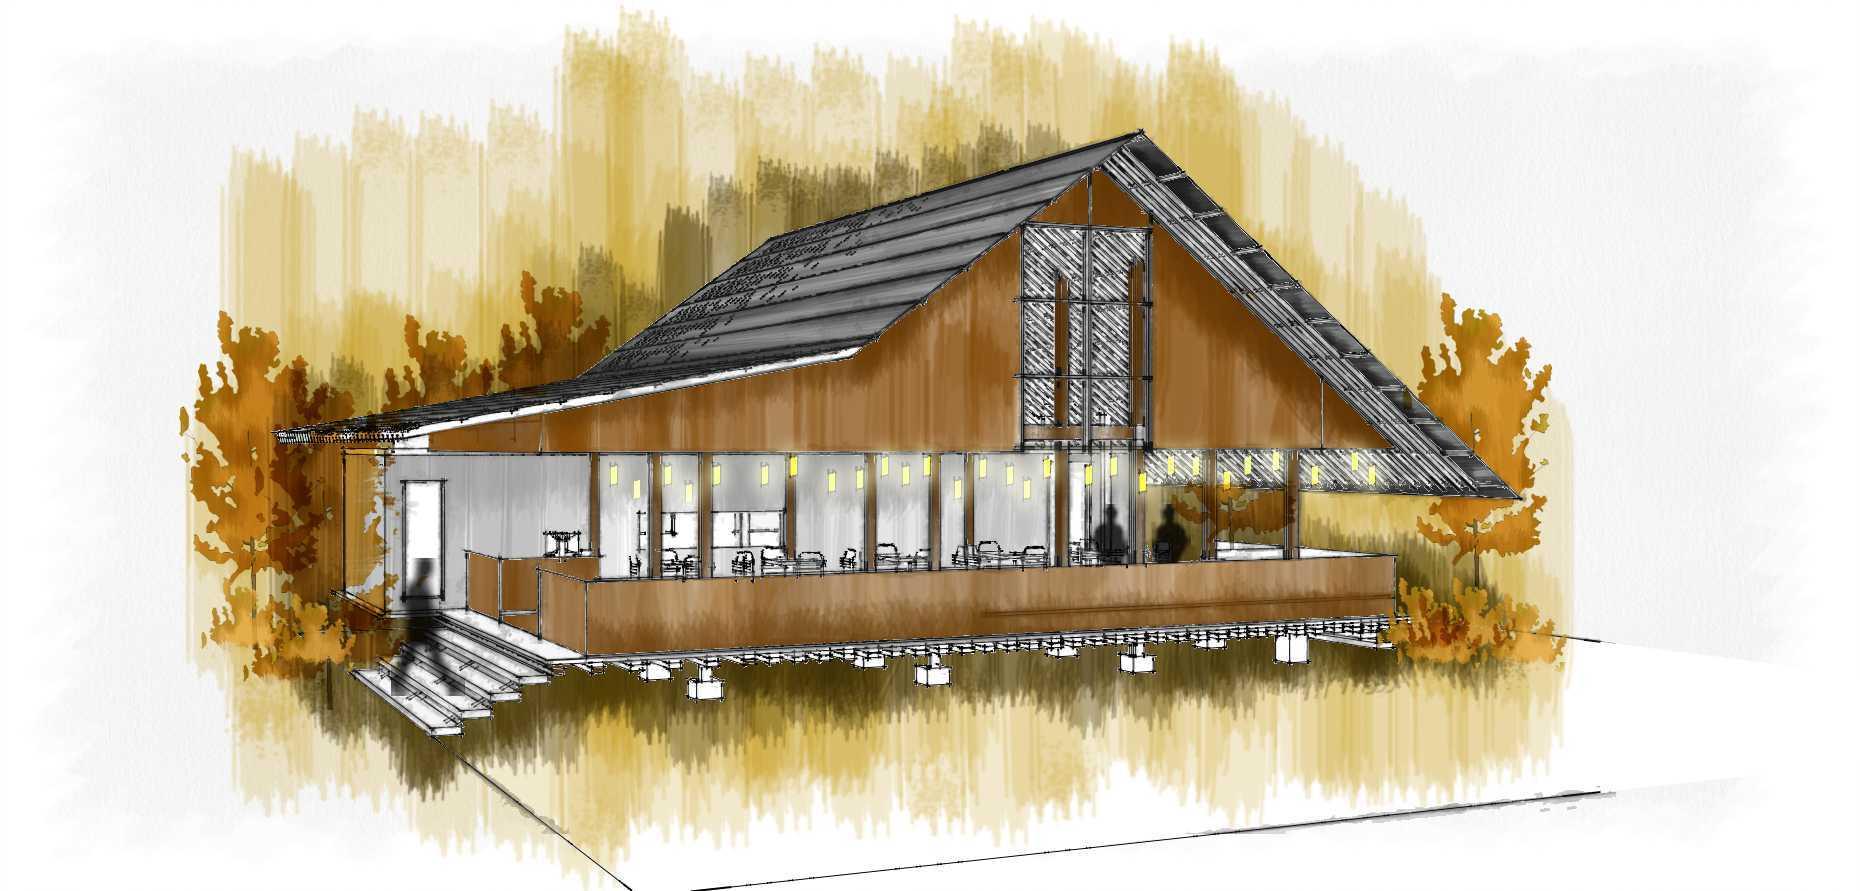 Atelier Baou+ Baduy Resto Pantai Tj. Lesung, Banten, Indonesia Pantai Tj. Lesung, Banten, Indonesia Exterior View Traditional  52459